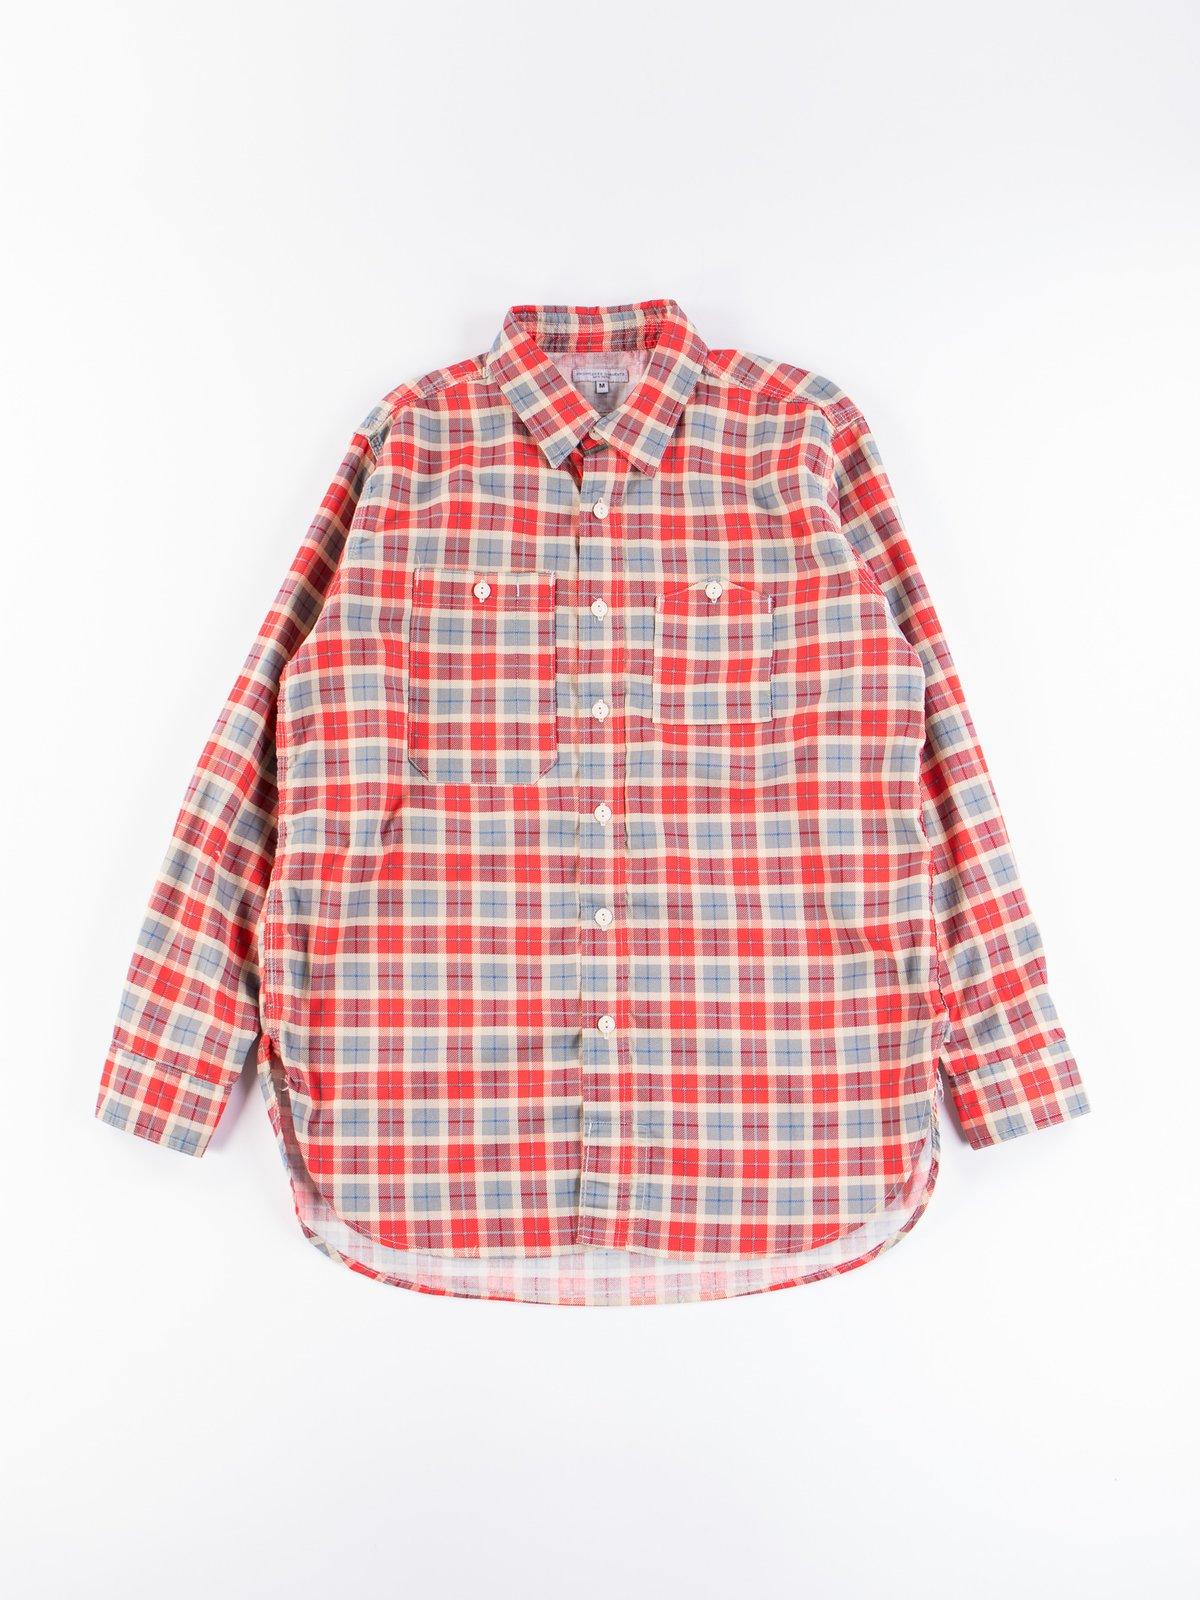 Red/Beige Cotton Printed Plaid Work Shirt - Image 1